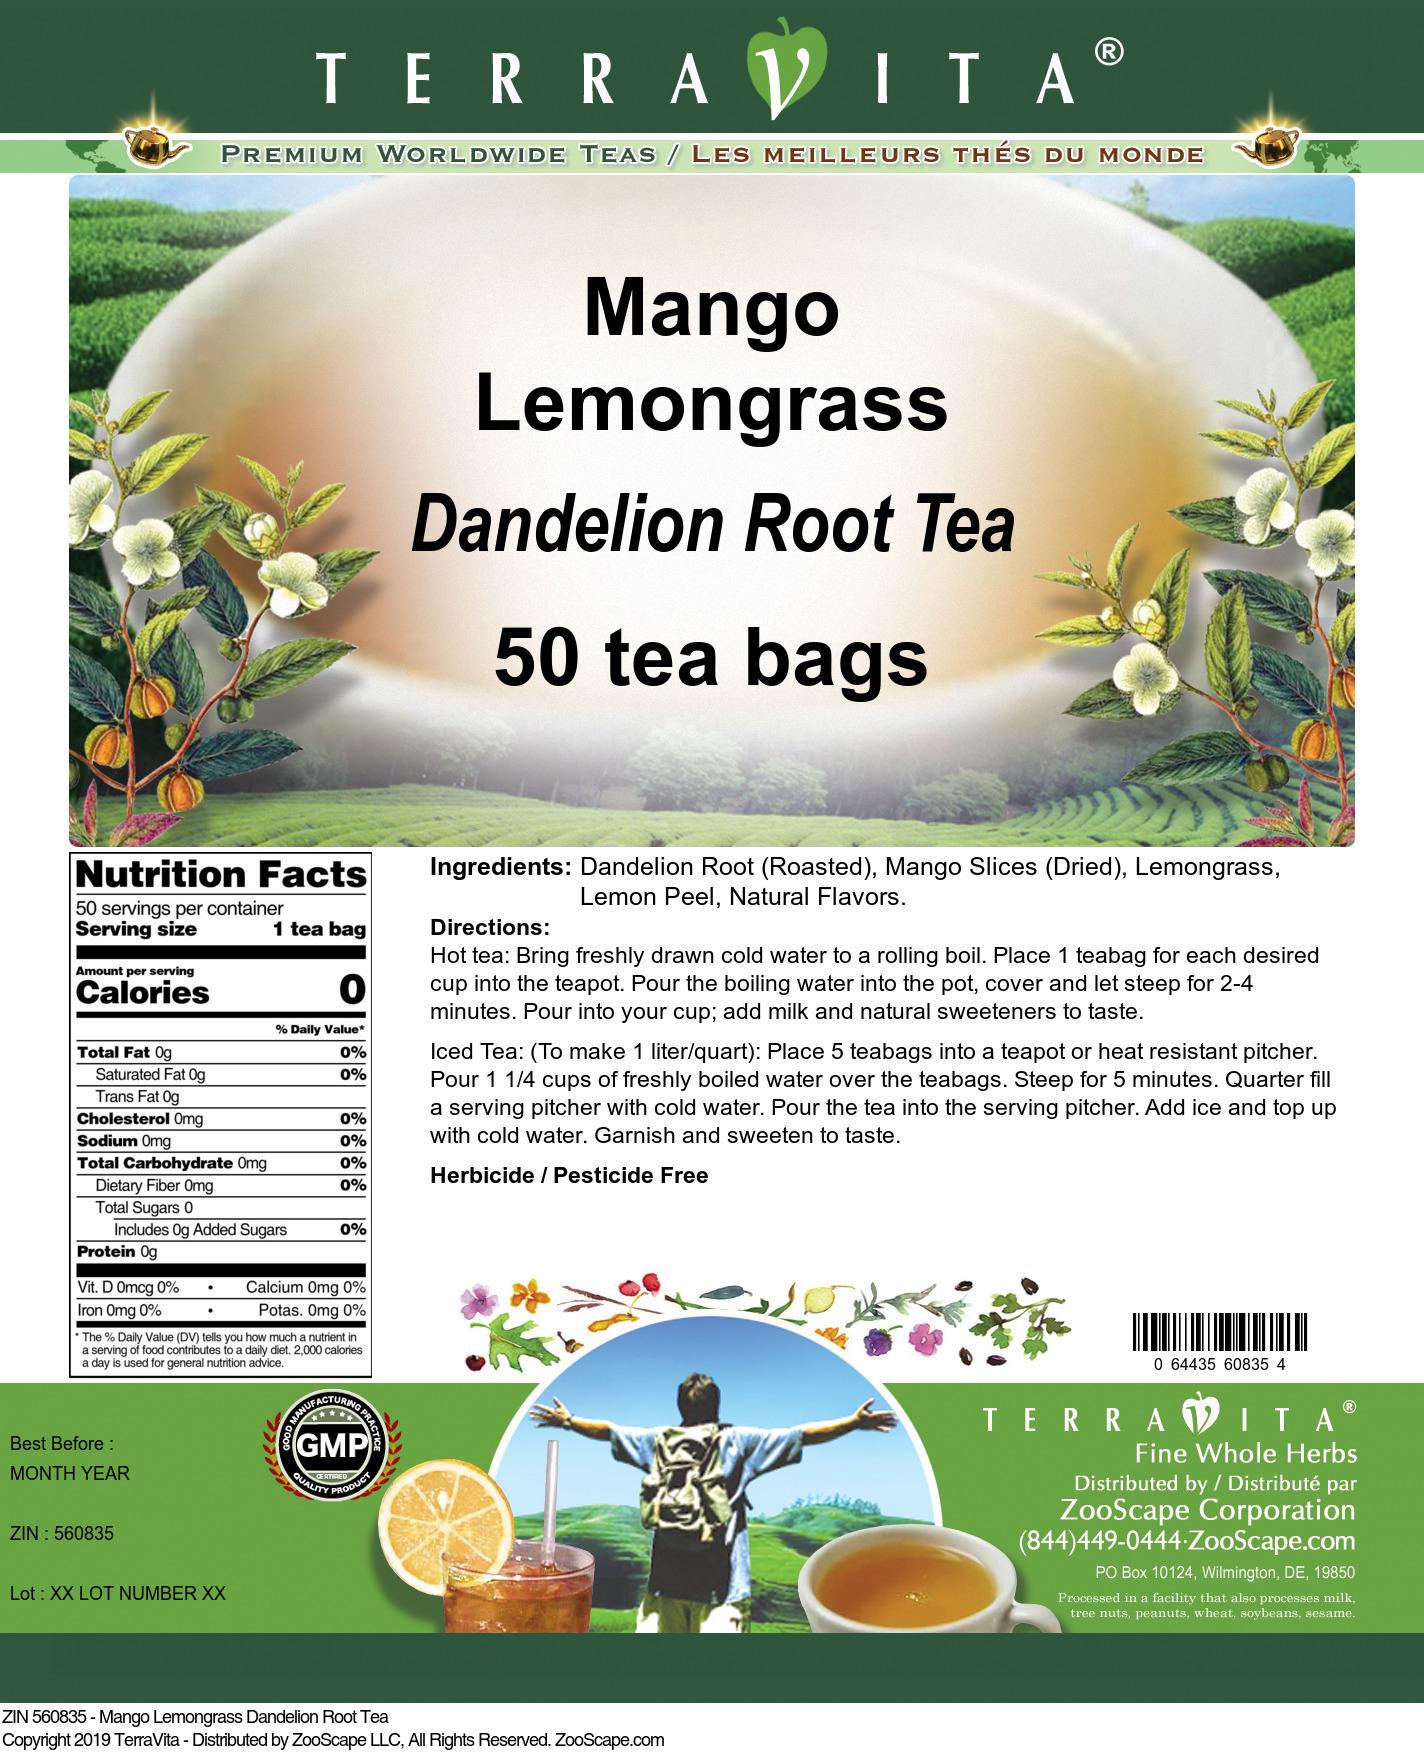 Mango Lemongrass Dandelion Root Tea